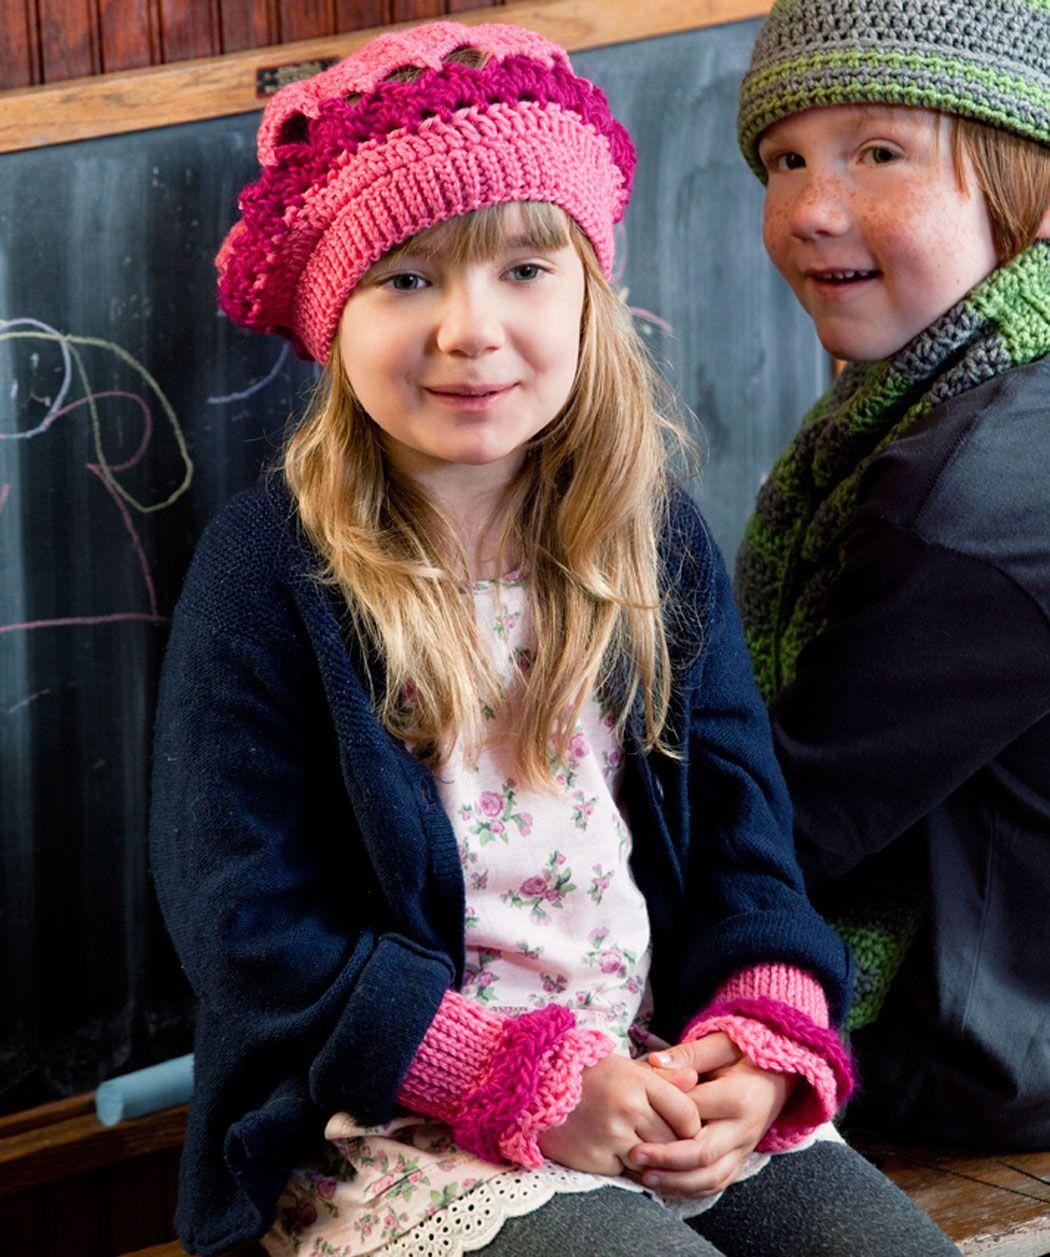 Little girls beret and wristers crochet pattern httpwww little girls beret and wristers crochet pattern httpredheart bankloansurffo Gallery